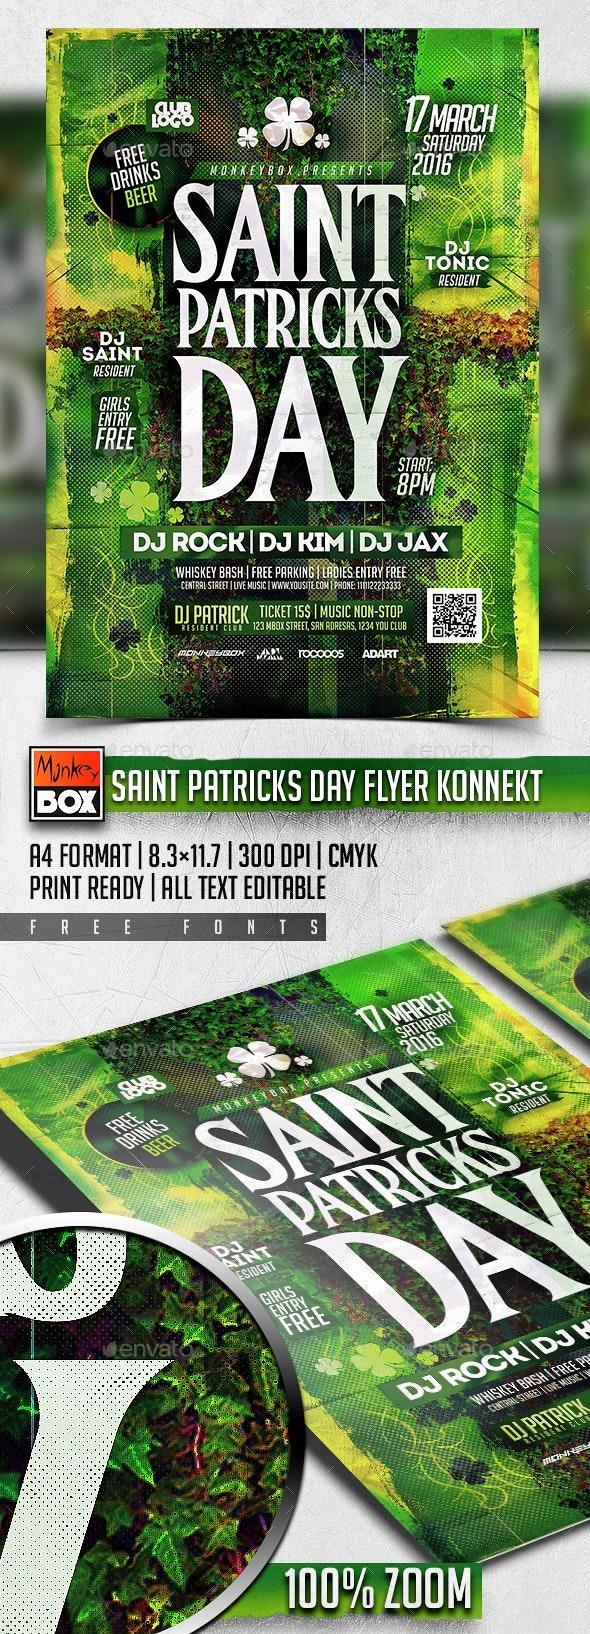 Saint Patricks Day Flyer Konnekt - Holidays Events